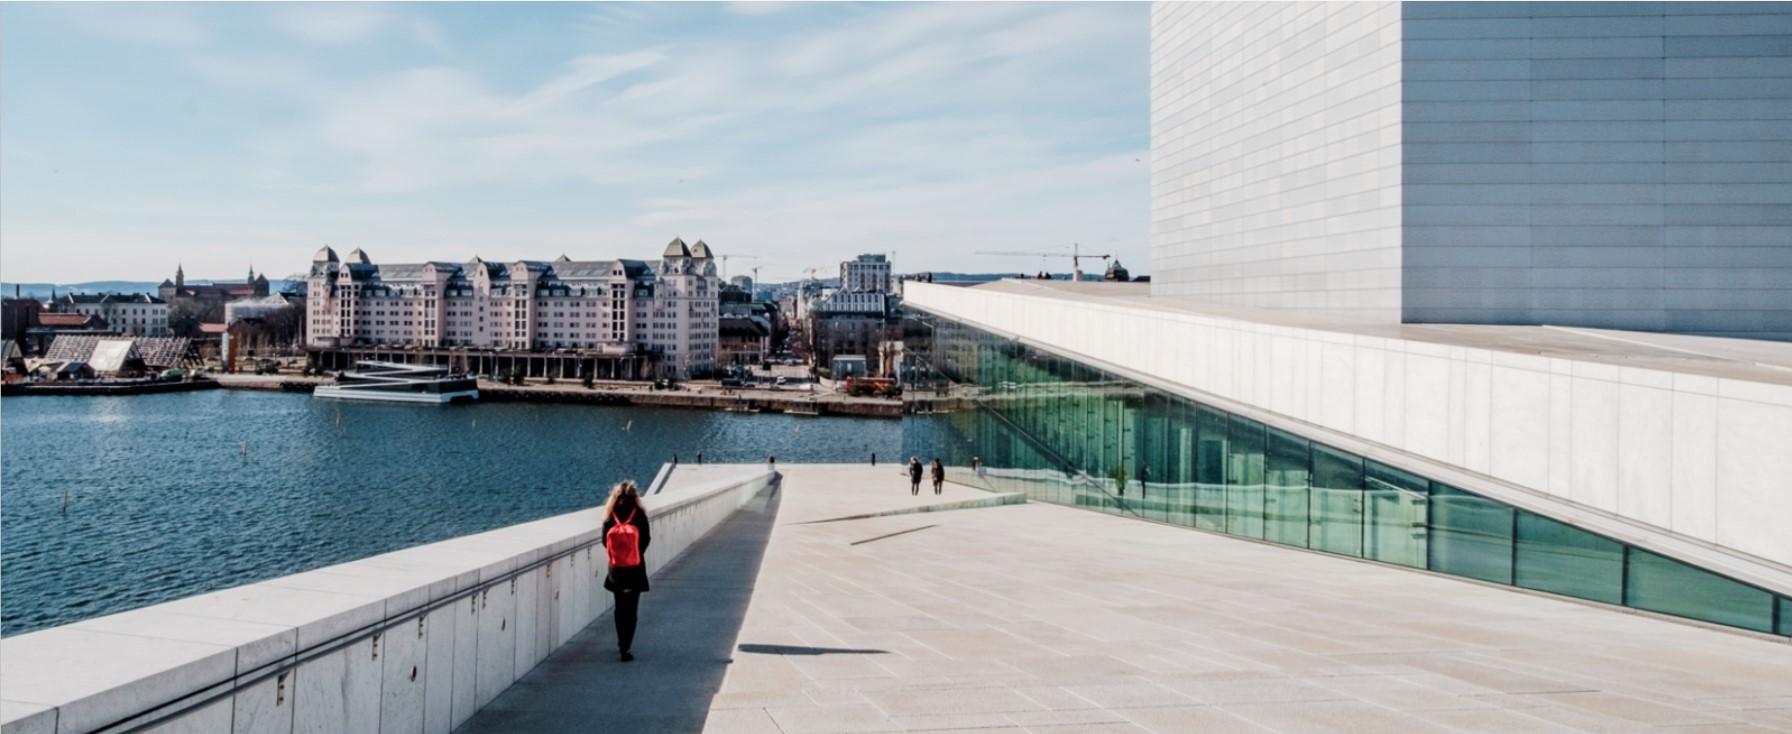 The first online Nordic co-design: New European Bauhaus event